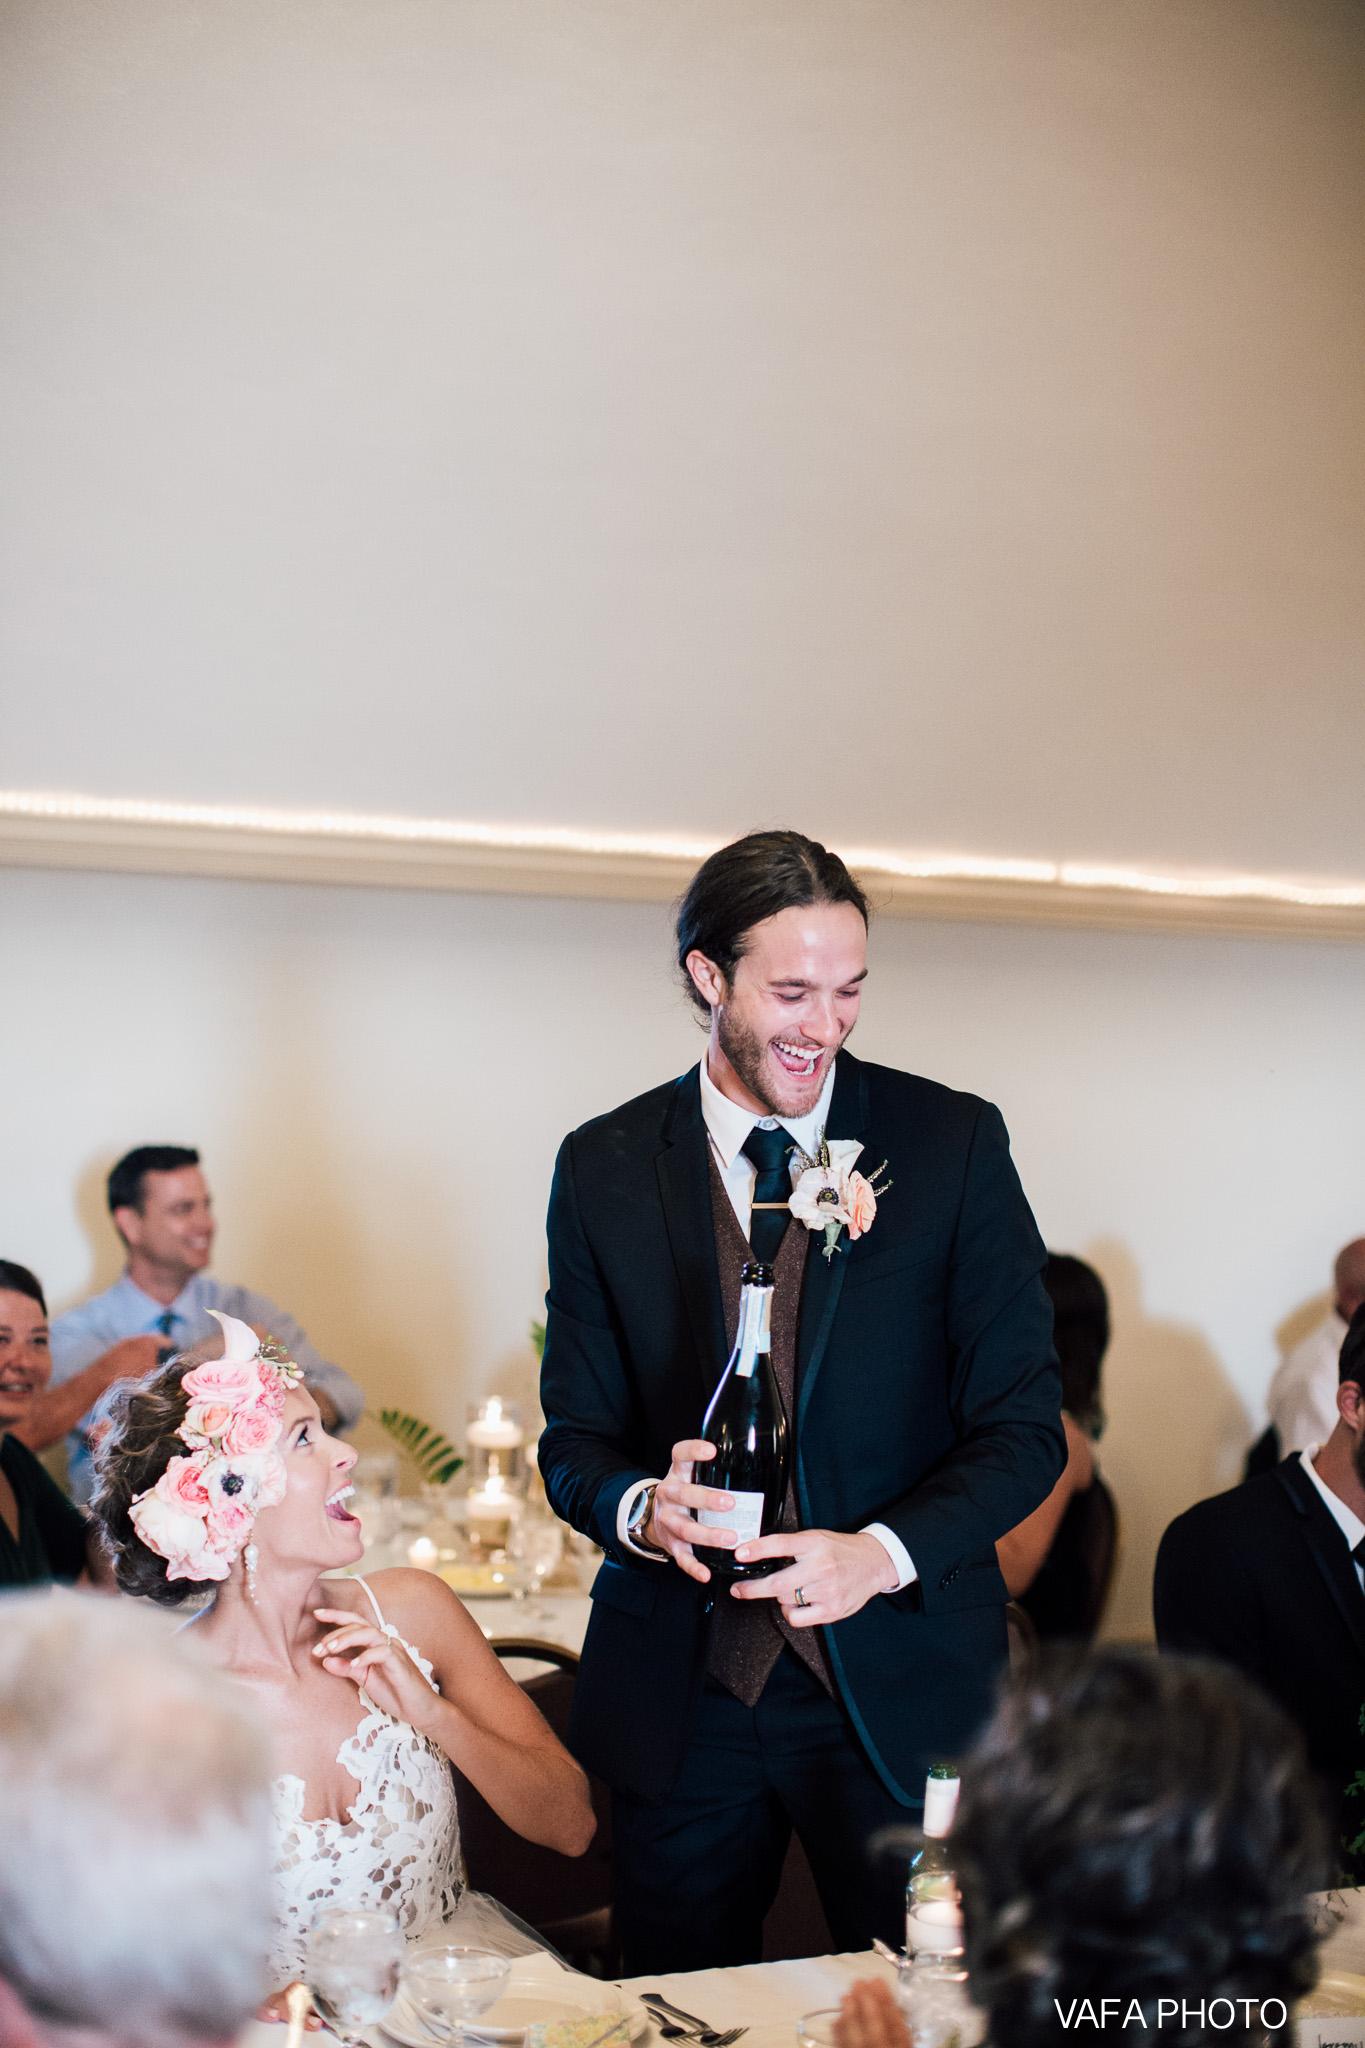 The-Felt-Estate-Wedding-Kailie-David-Vafa-Photo-934.jpg